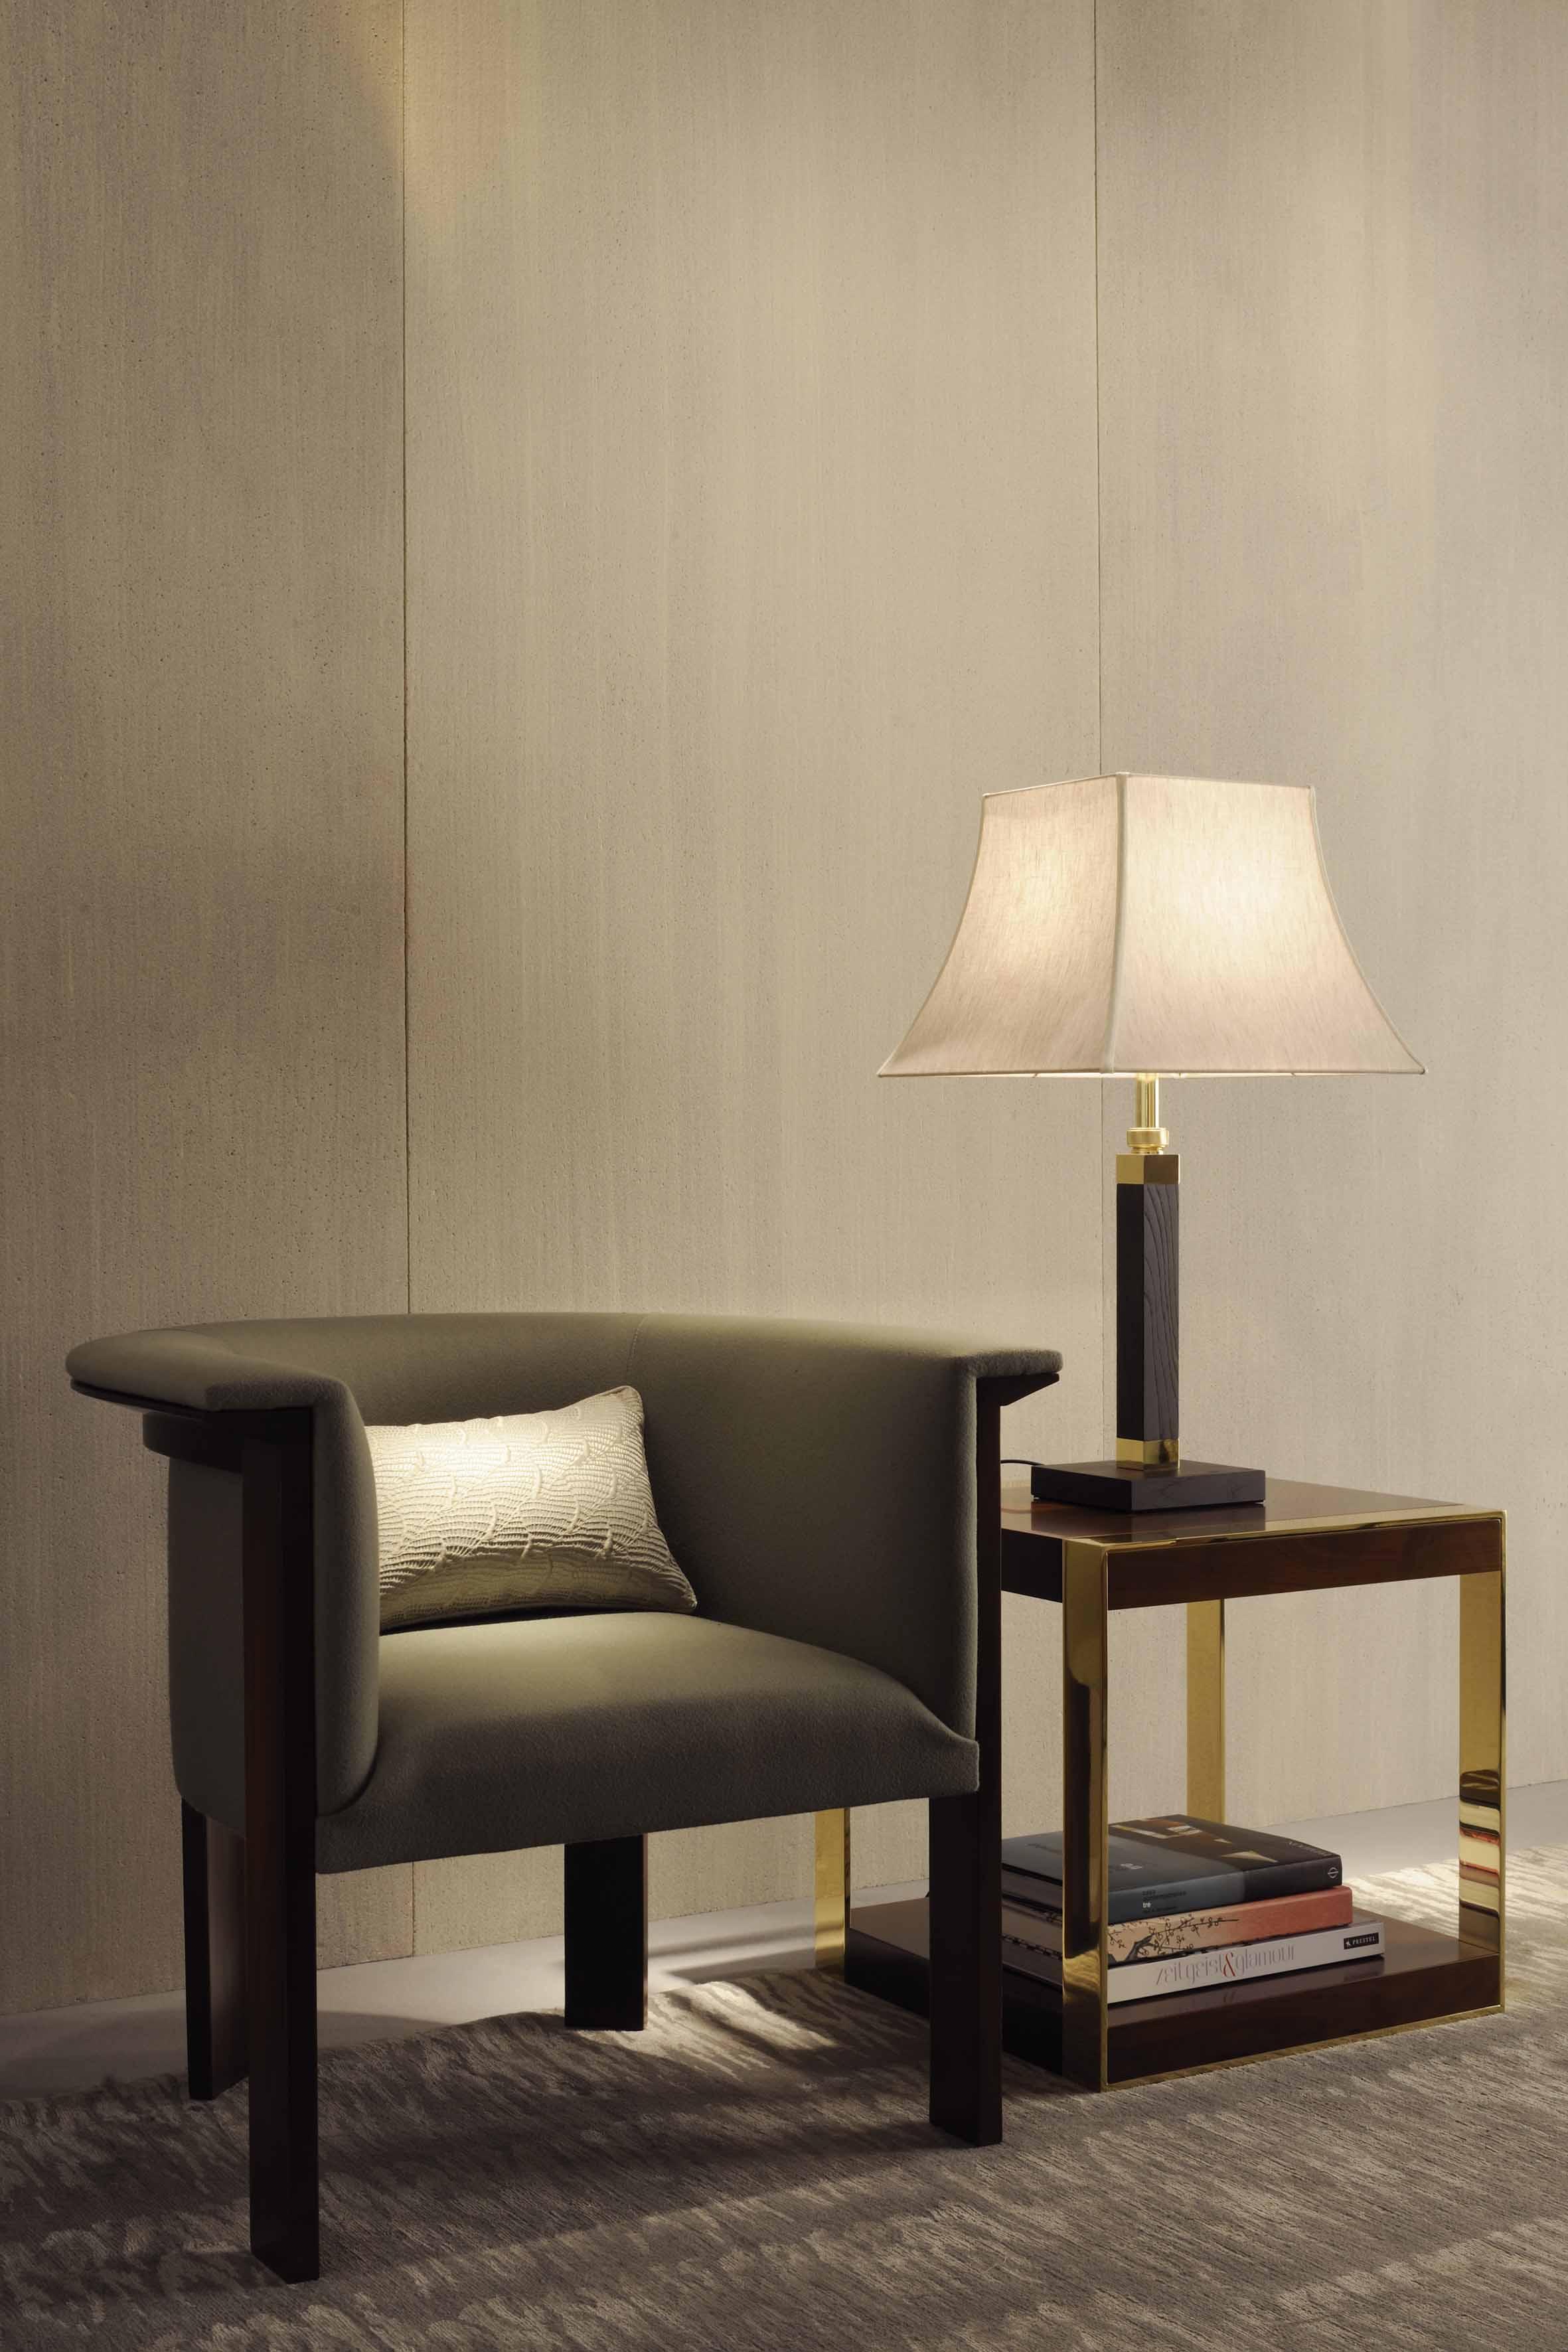 Muebles lujo hogar 20170914220719 for Muebles de hogar